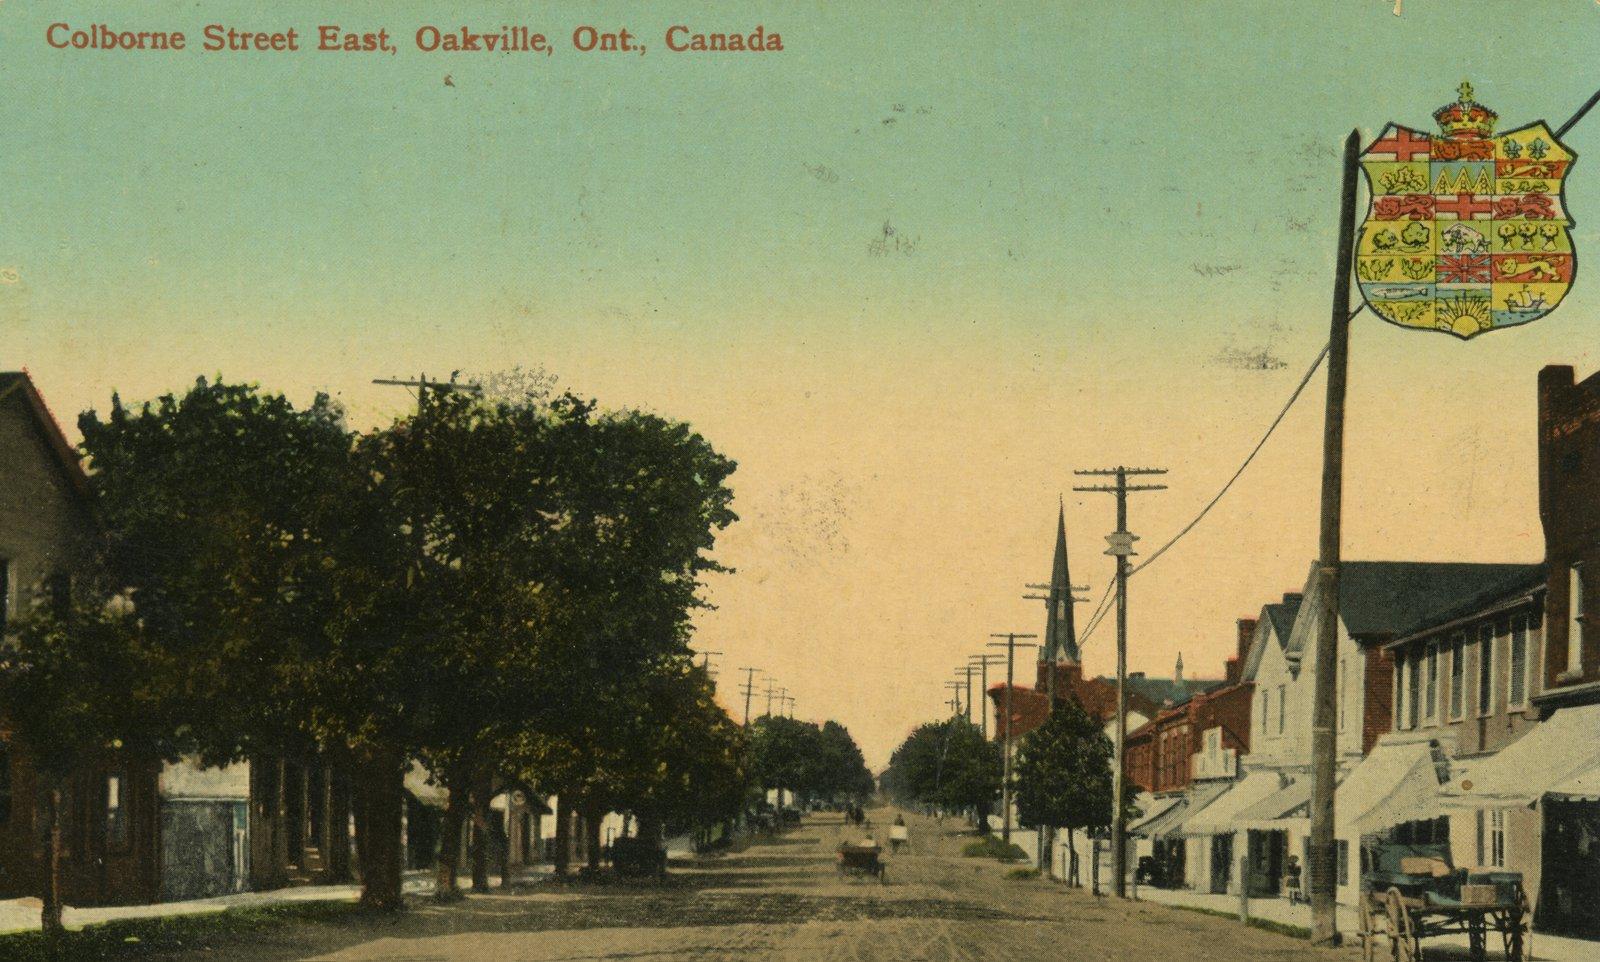 Colborne Street East, Oakville, Ont.: postcard.